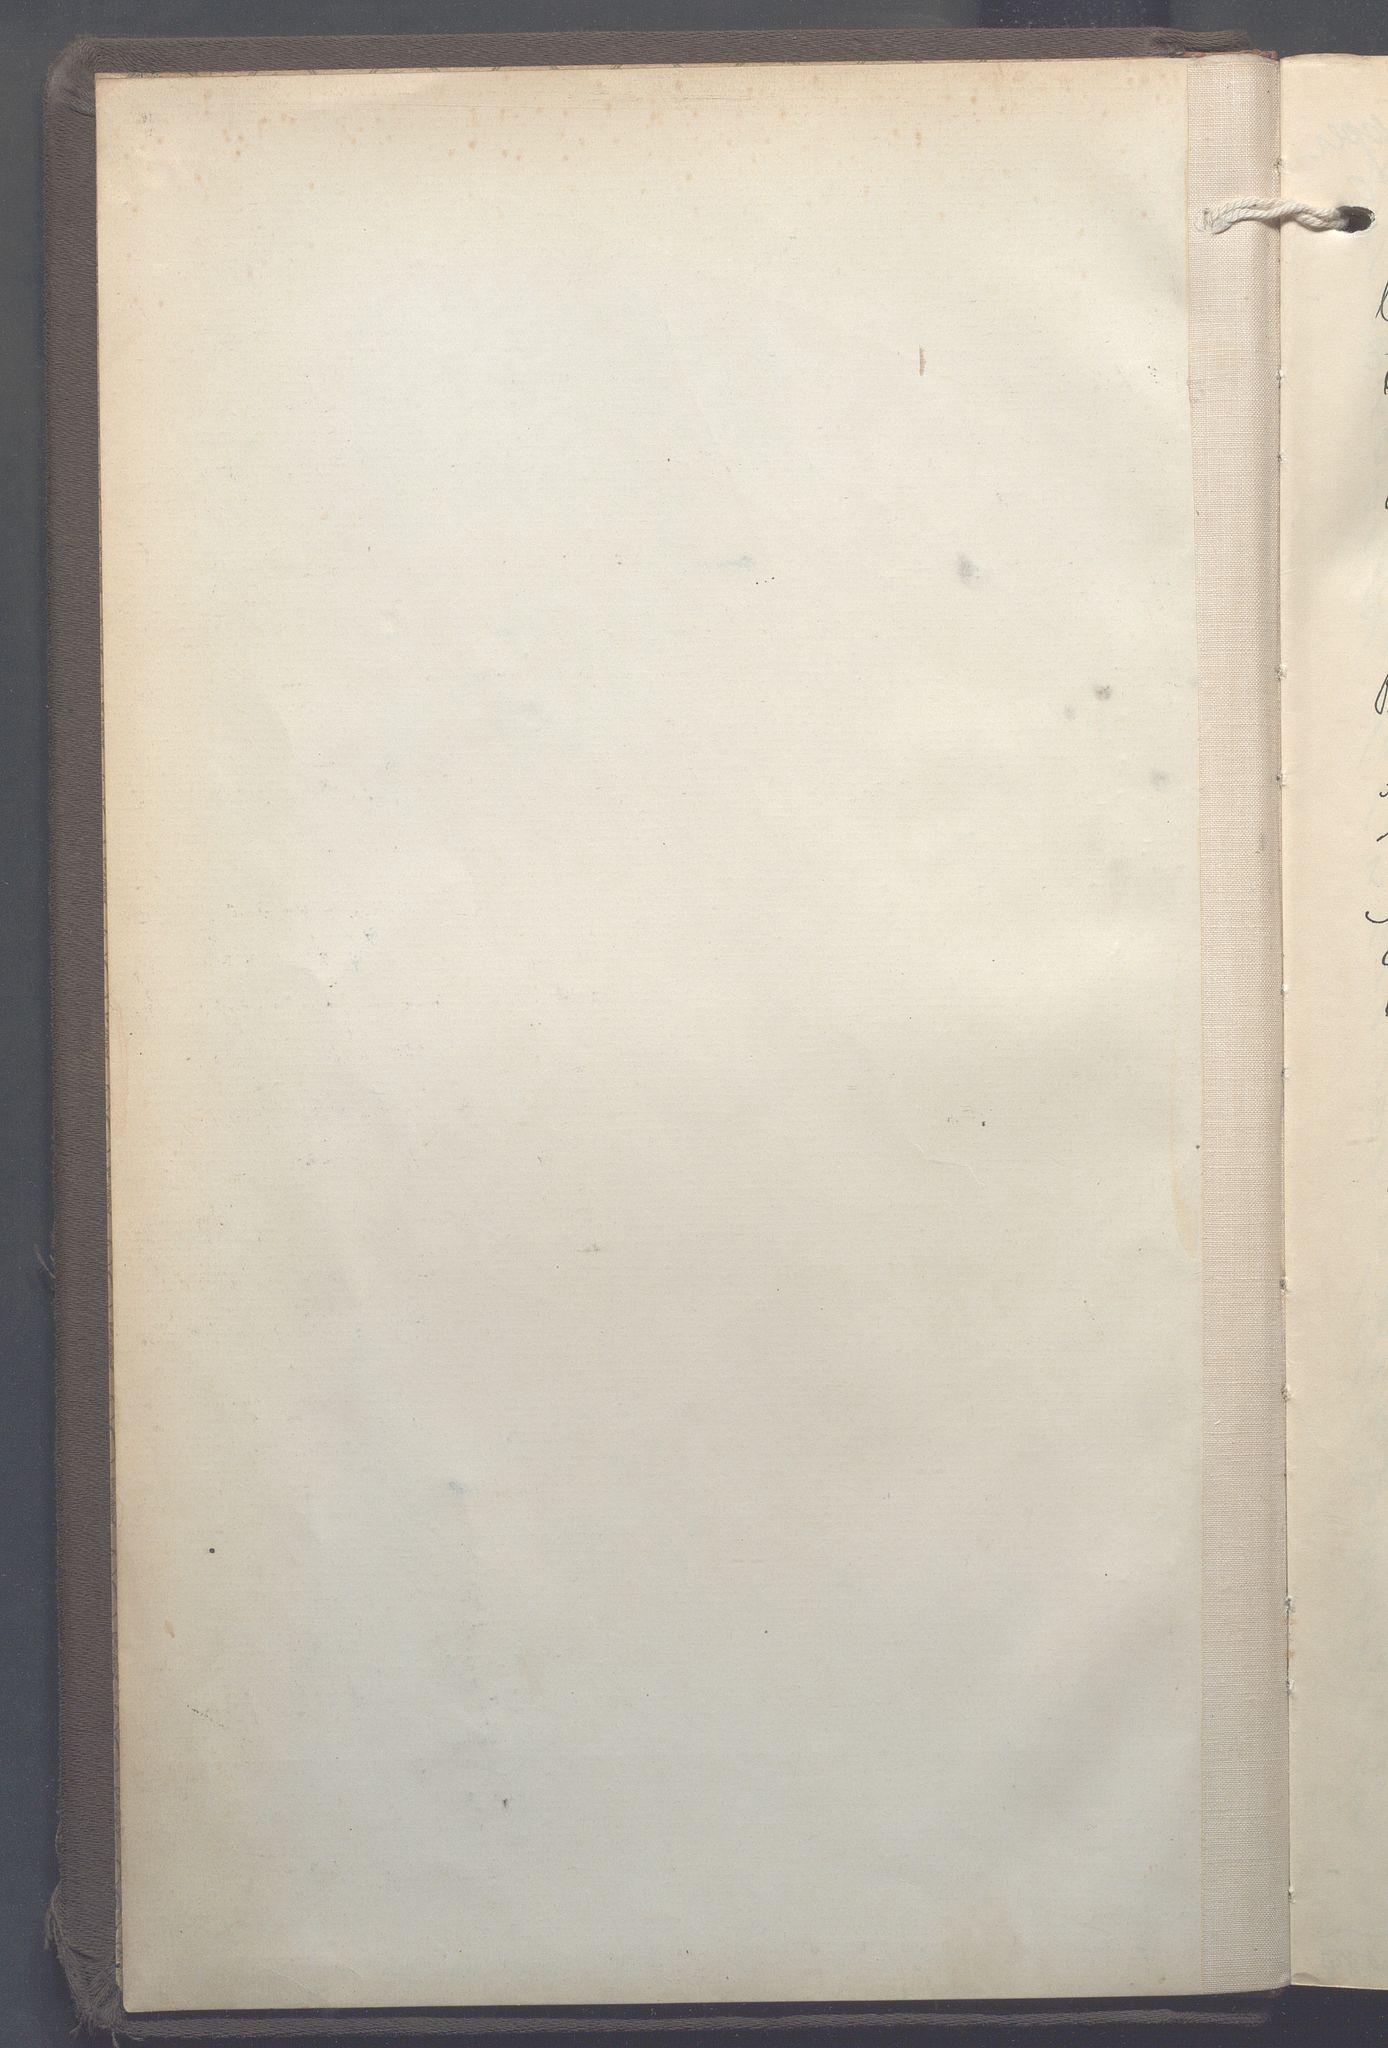 OBA, Lensmennene i Aker, F/Fa/L0024: Branntakstprotokoll, 1929-1932